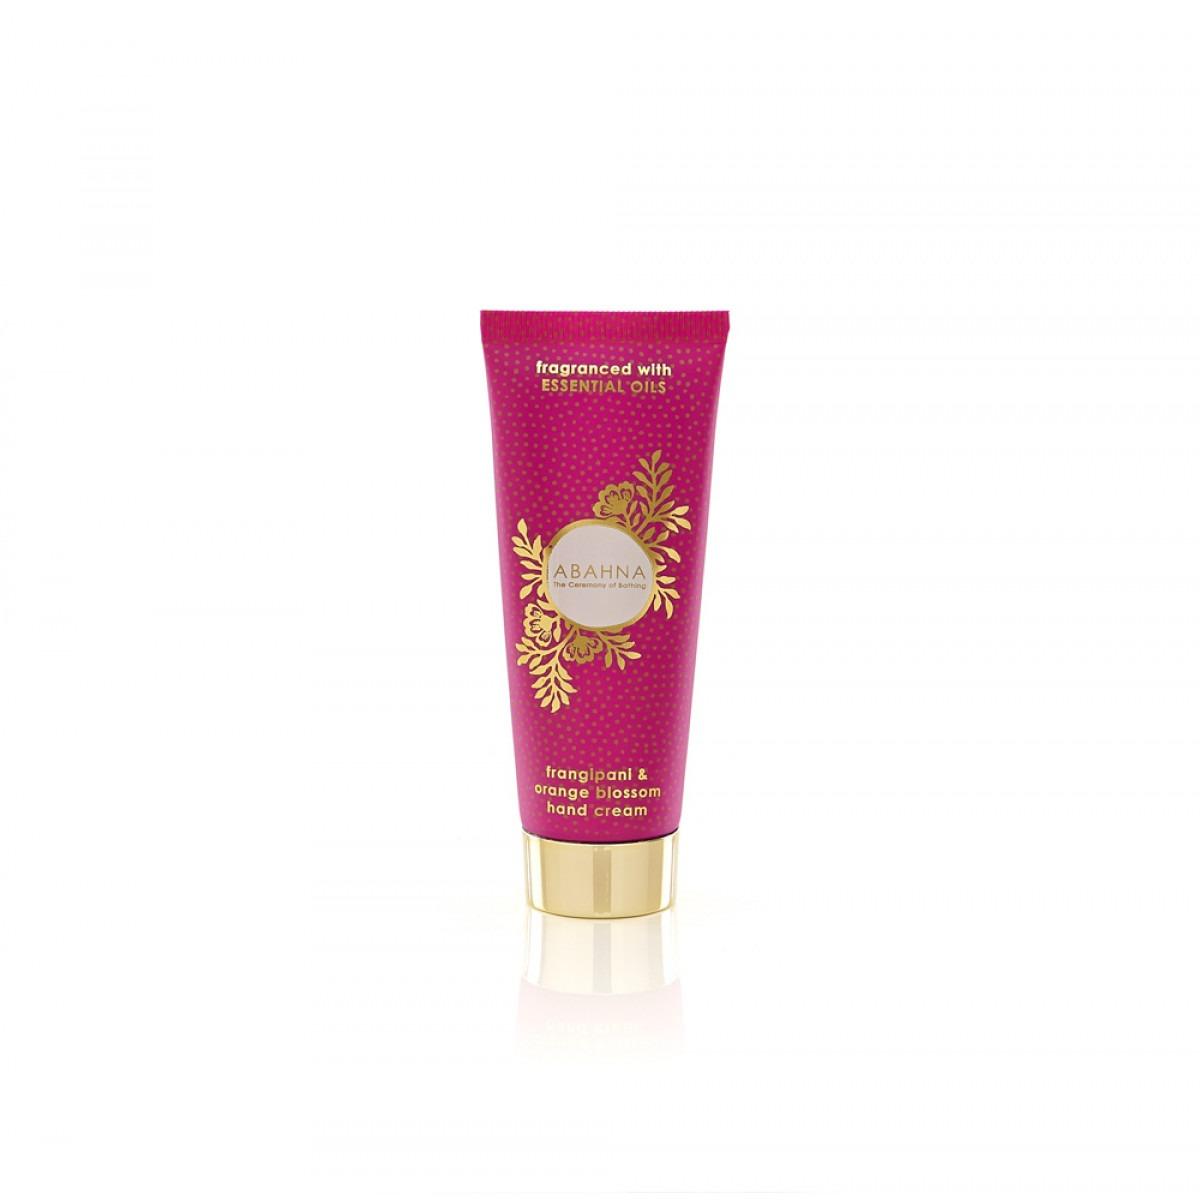 Abahna Frangipani & Orange Blossom Hand Cream 50ml